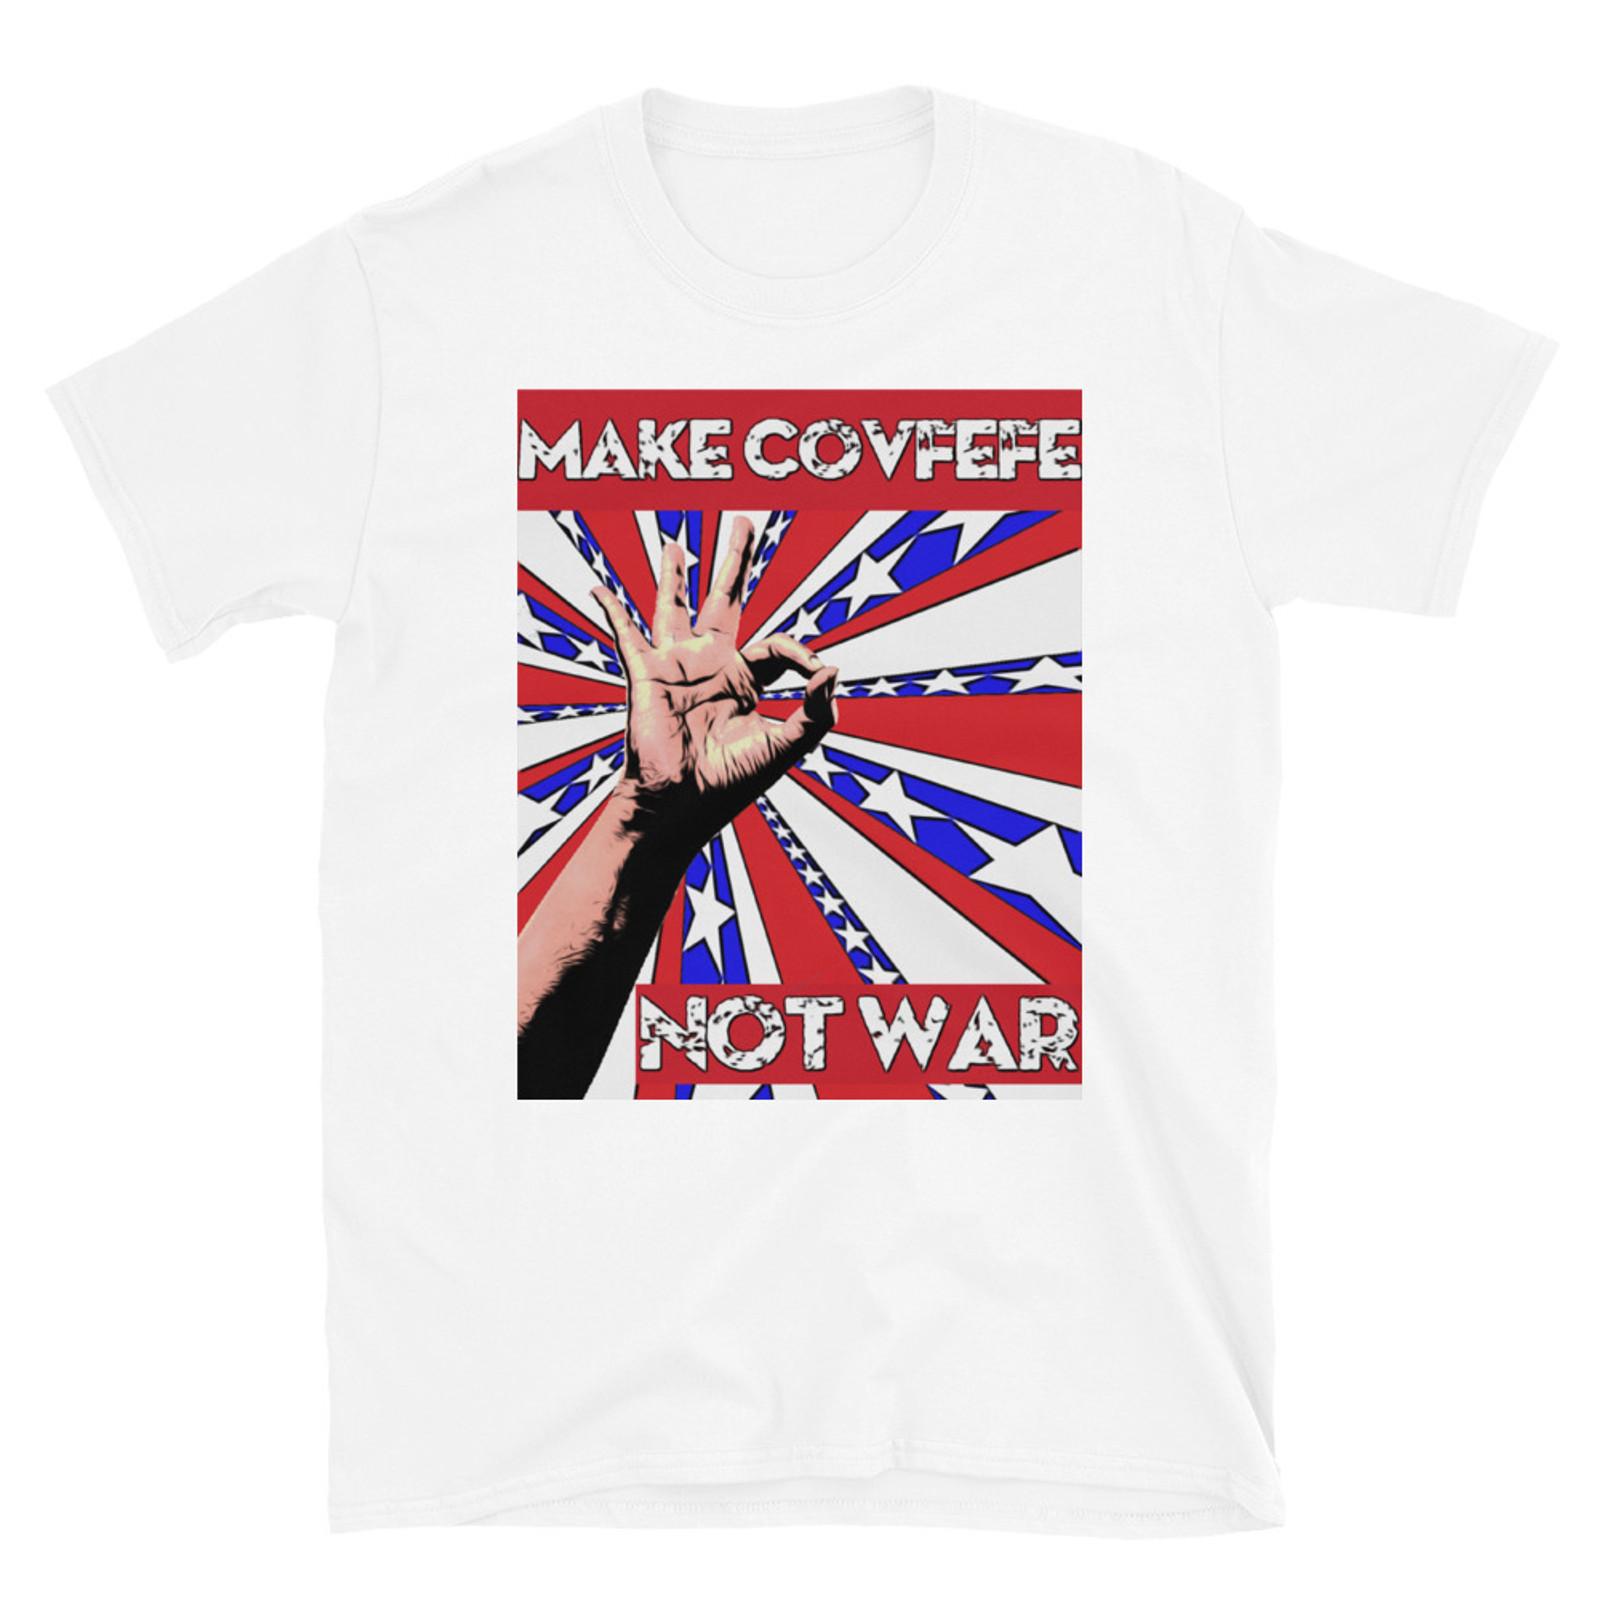 MAKE COVFEFE T-Shirt